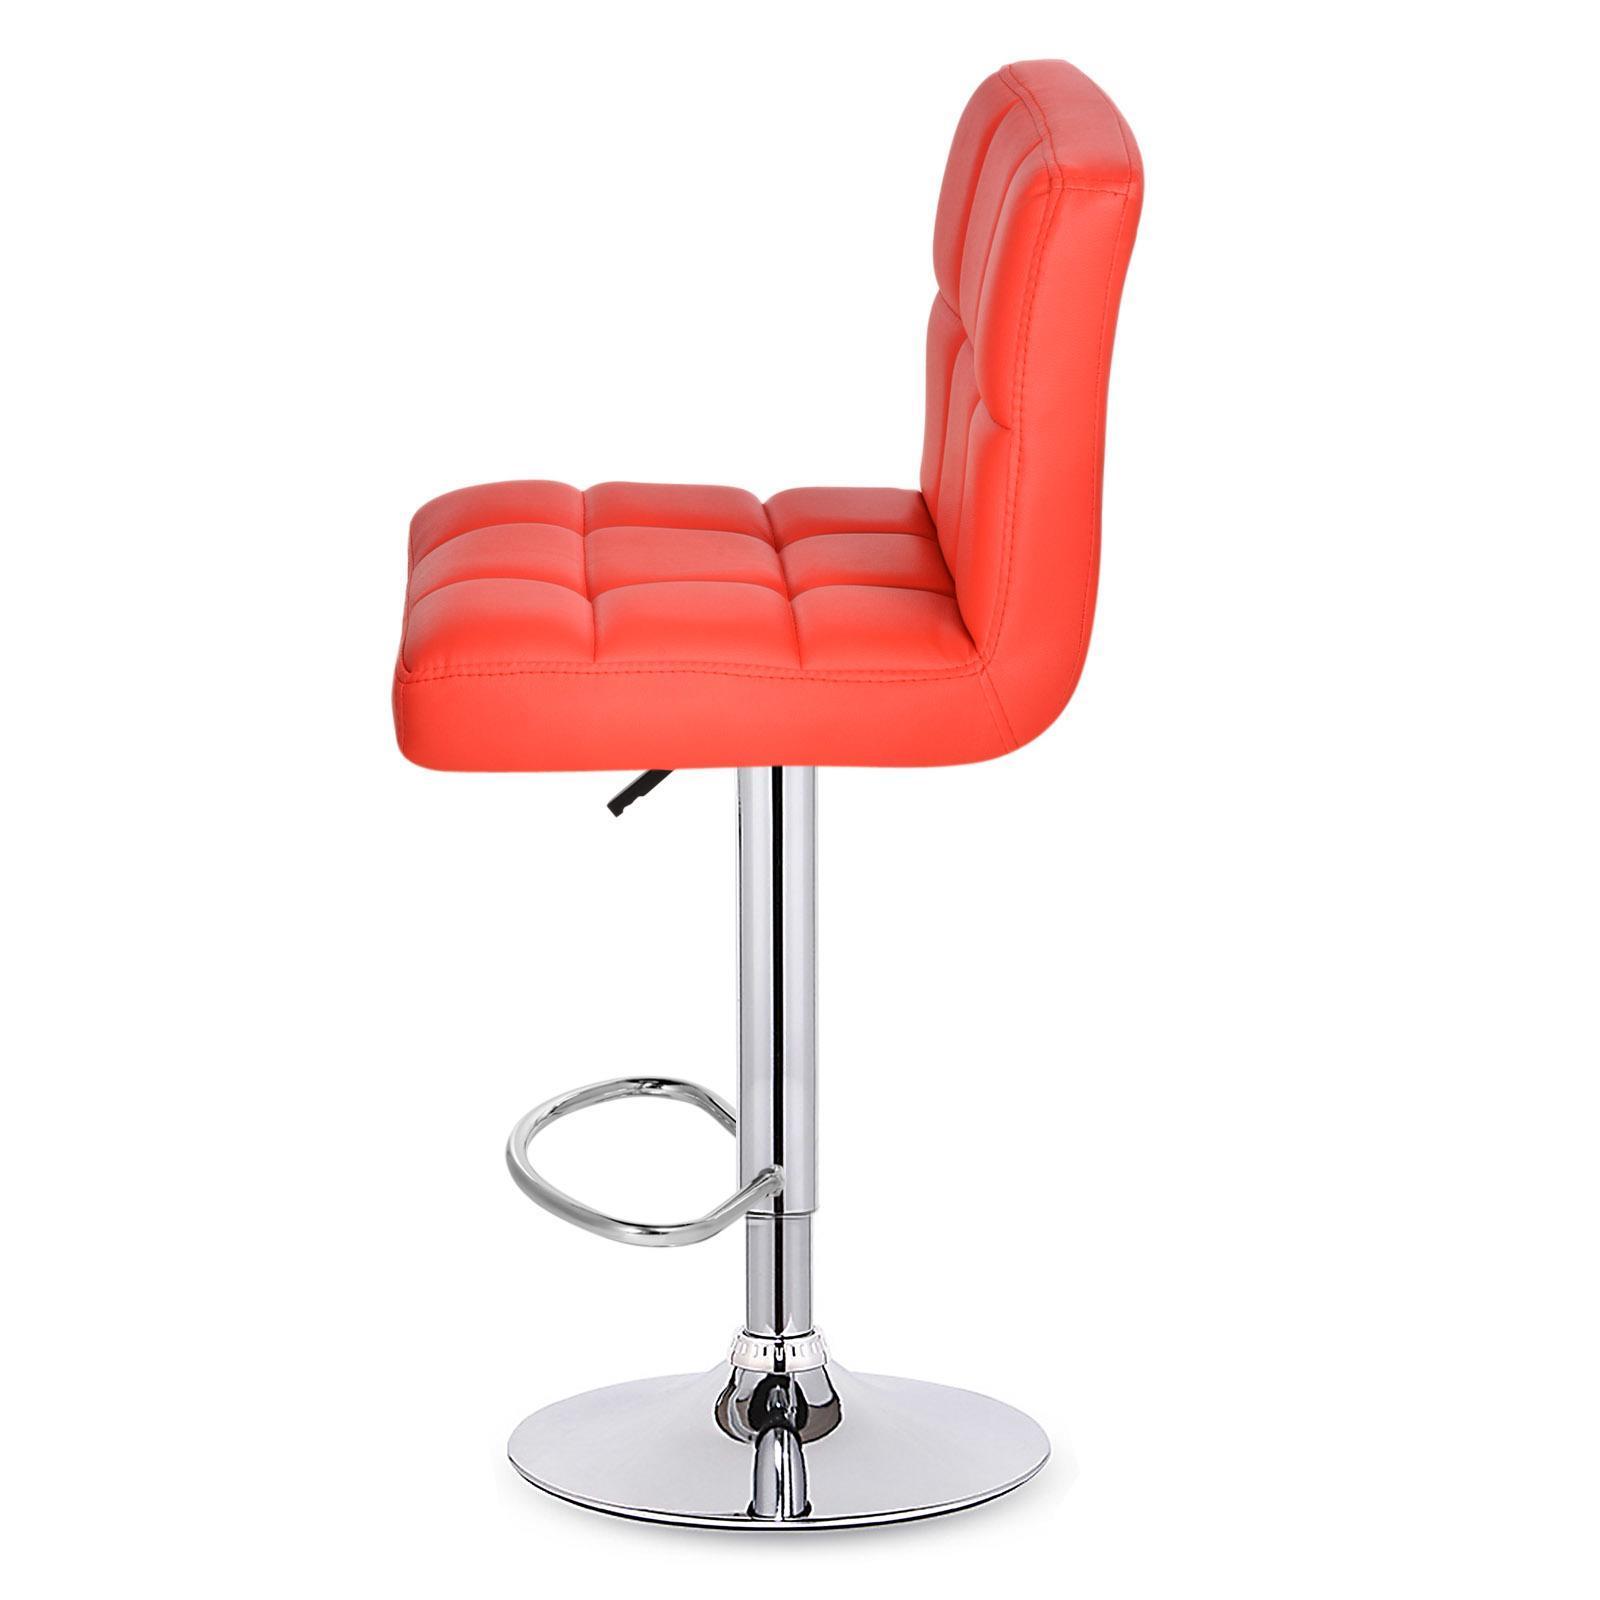 2 x cuir synth tique tabouret de bar pivot barre pu bureau petit d jeuner ebay. Black Bedroom Furniture Sets. Home Design Ideas